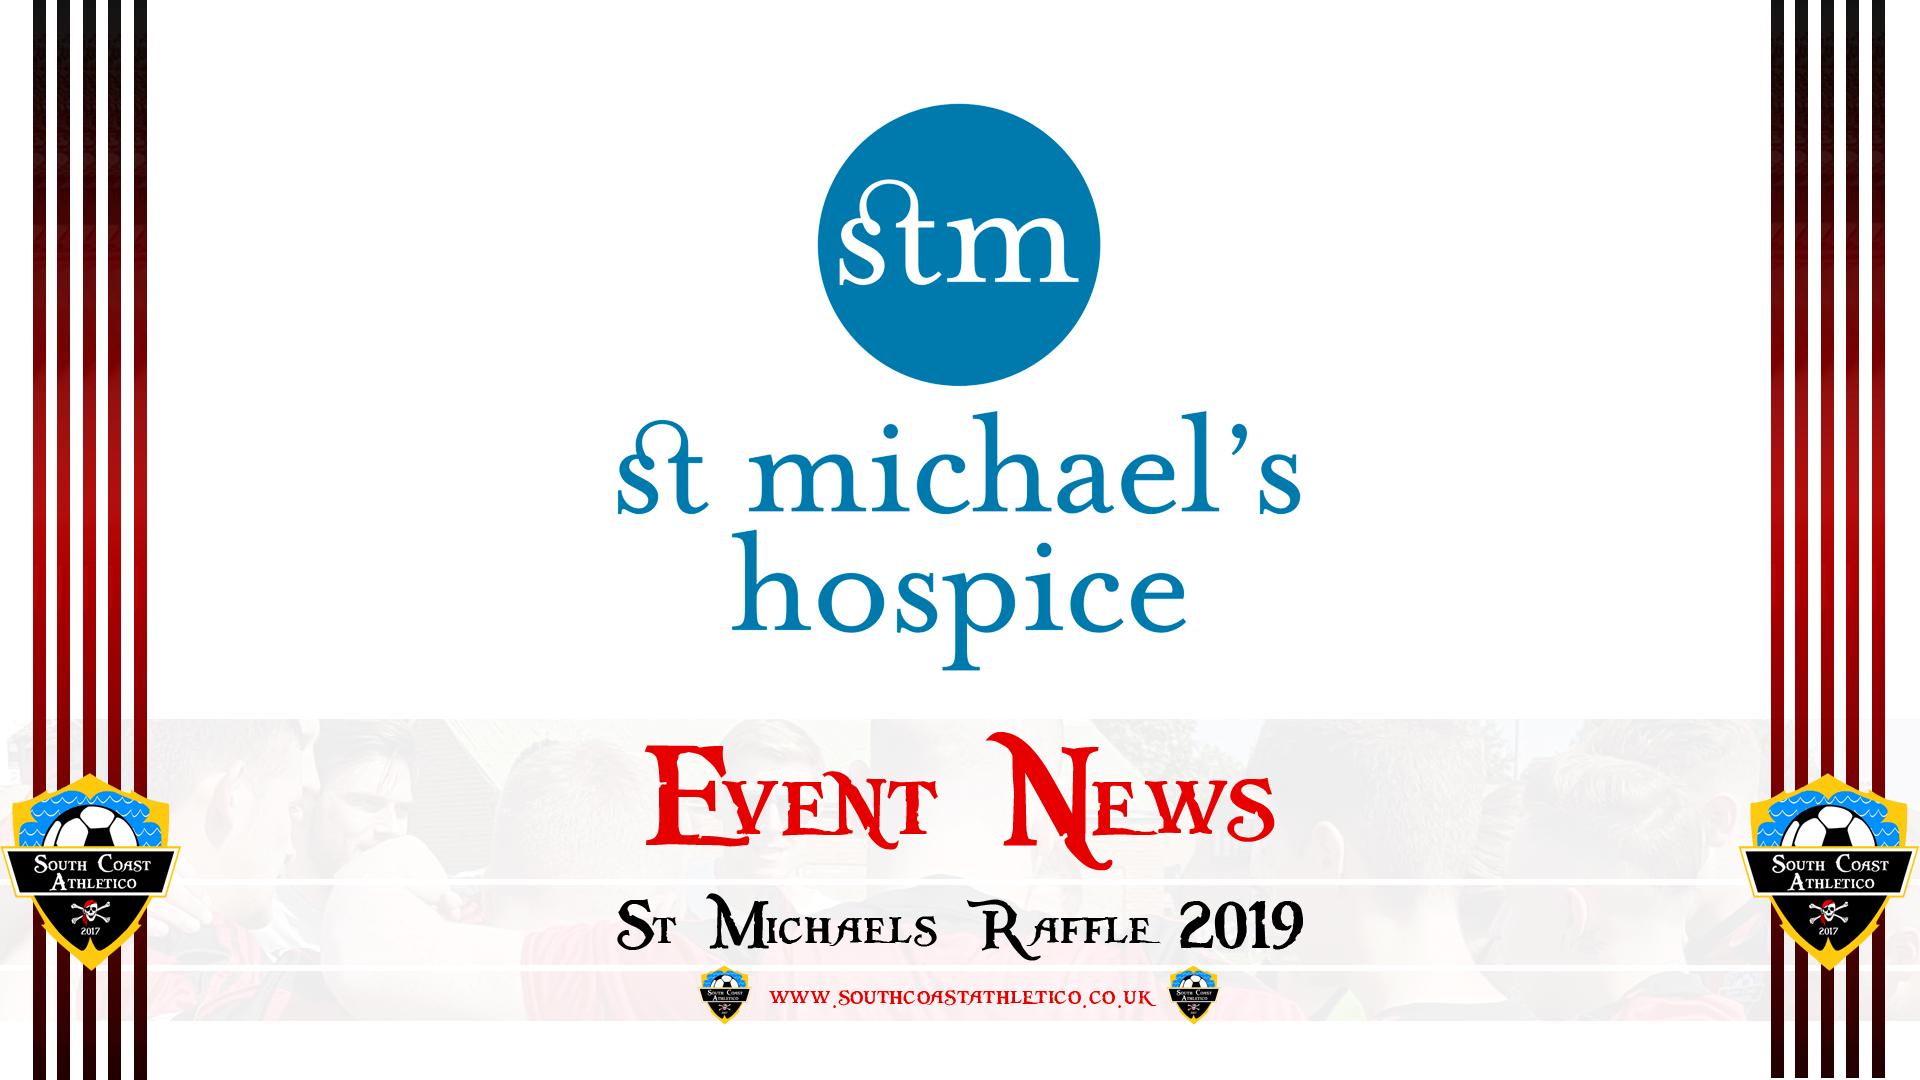 Event News – St Michael's Hospice Raffle – South Coast Athletico